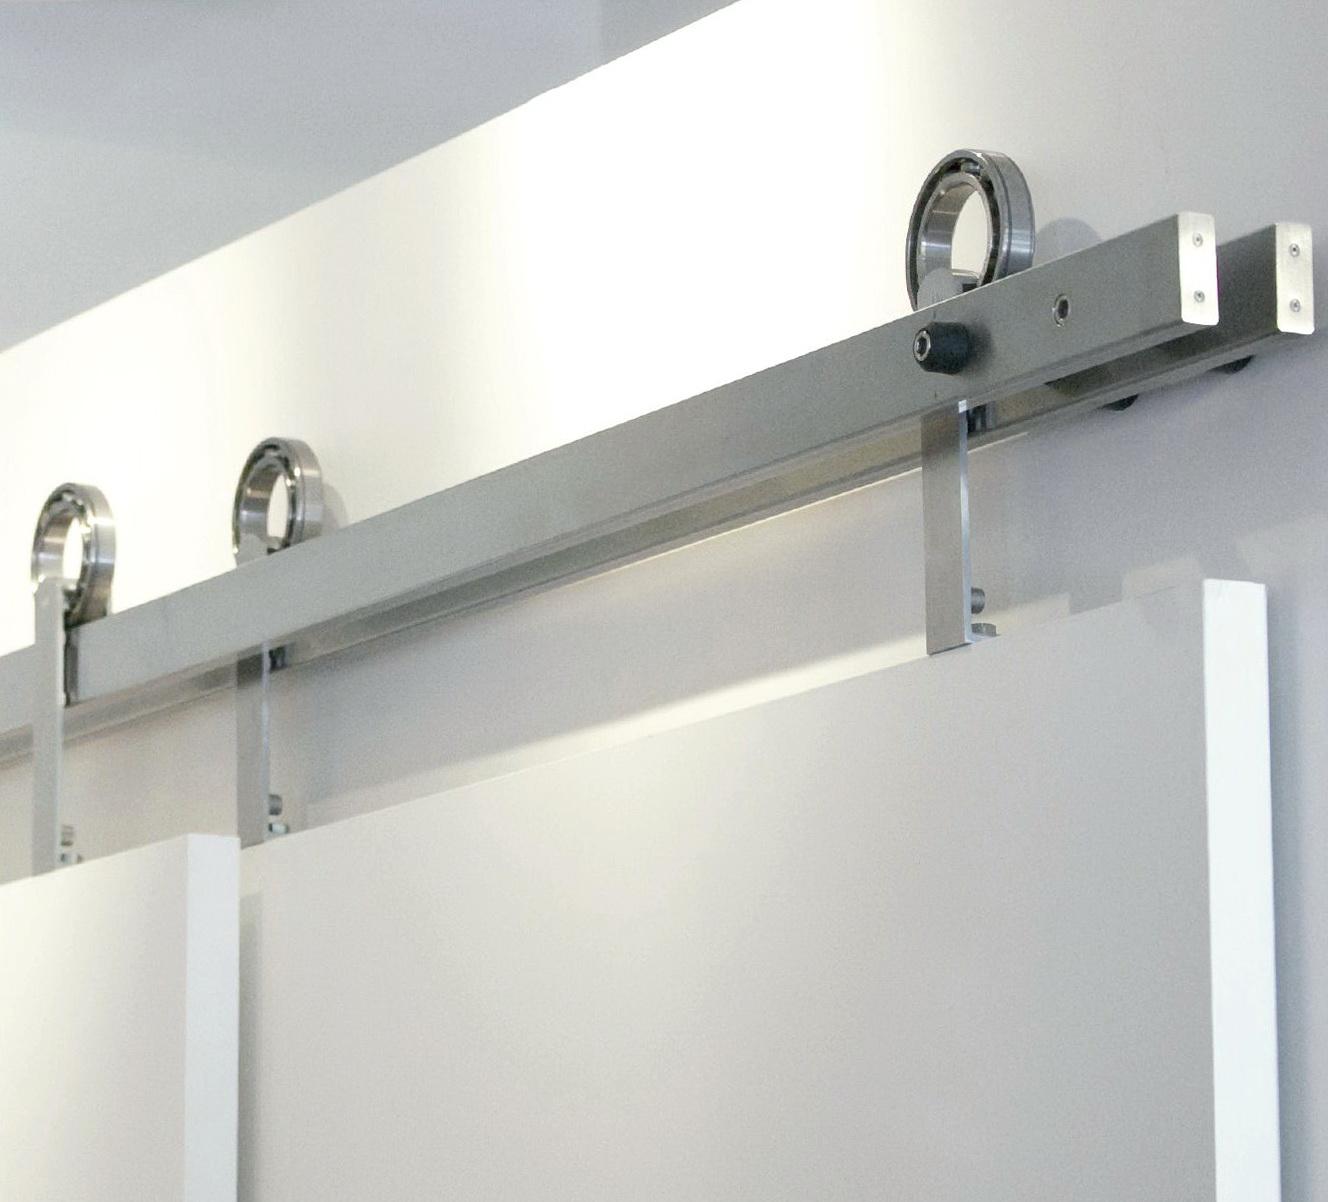 Bypass Closet Door Hardware Lowes Home Design Ideas